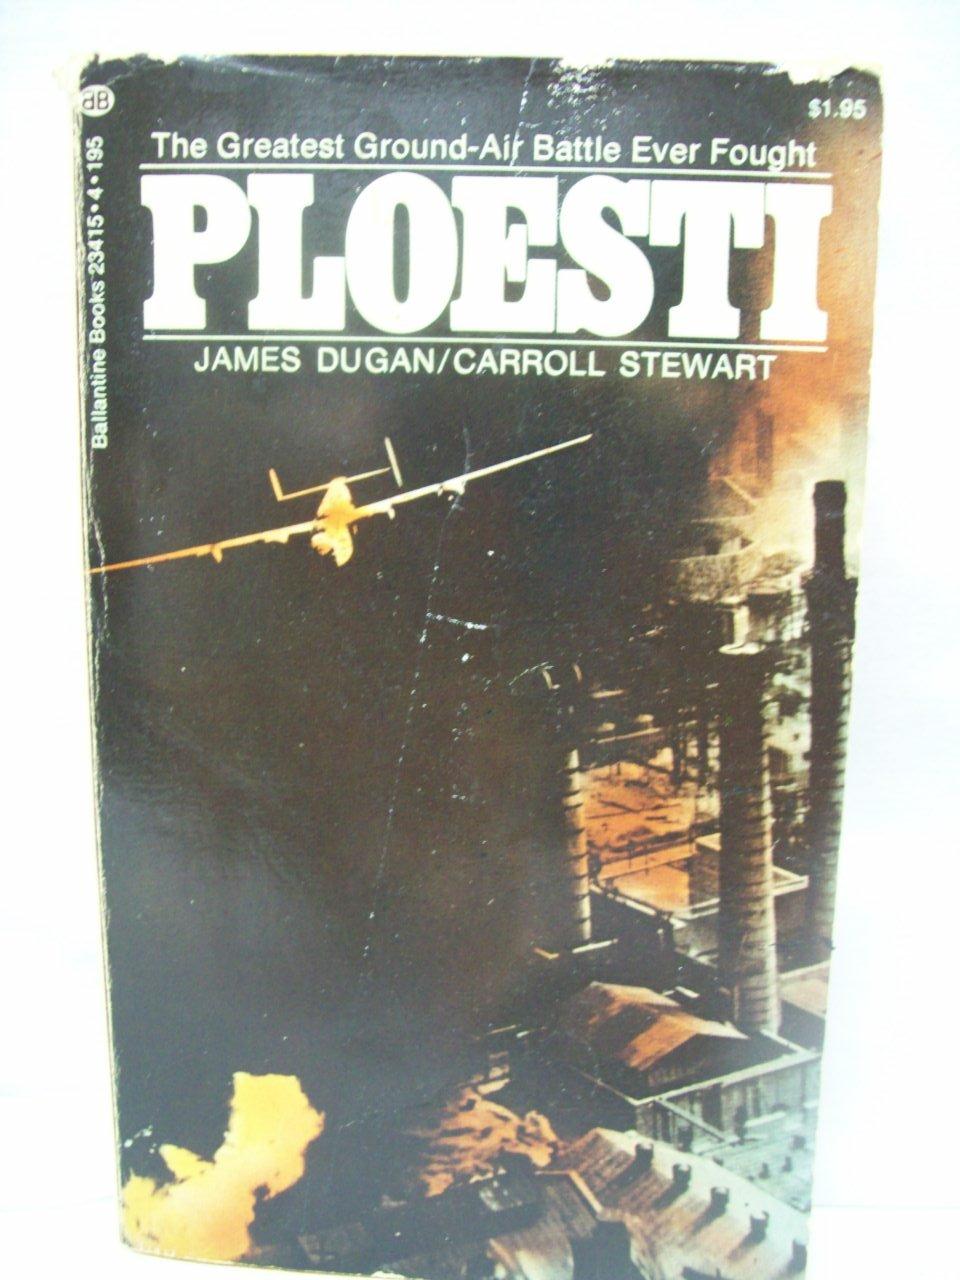 Ploesti,The Greatest Ground-Air Battle Ever Fought, Dugan, James/Carroll Stewart